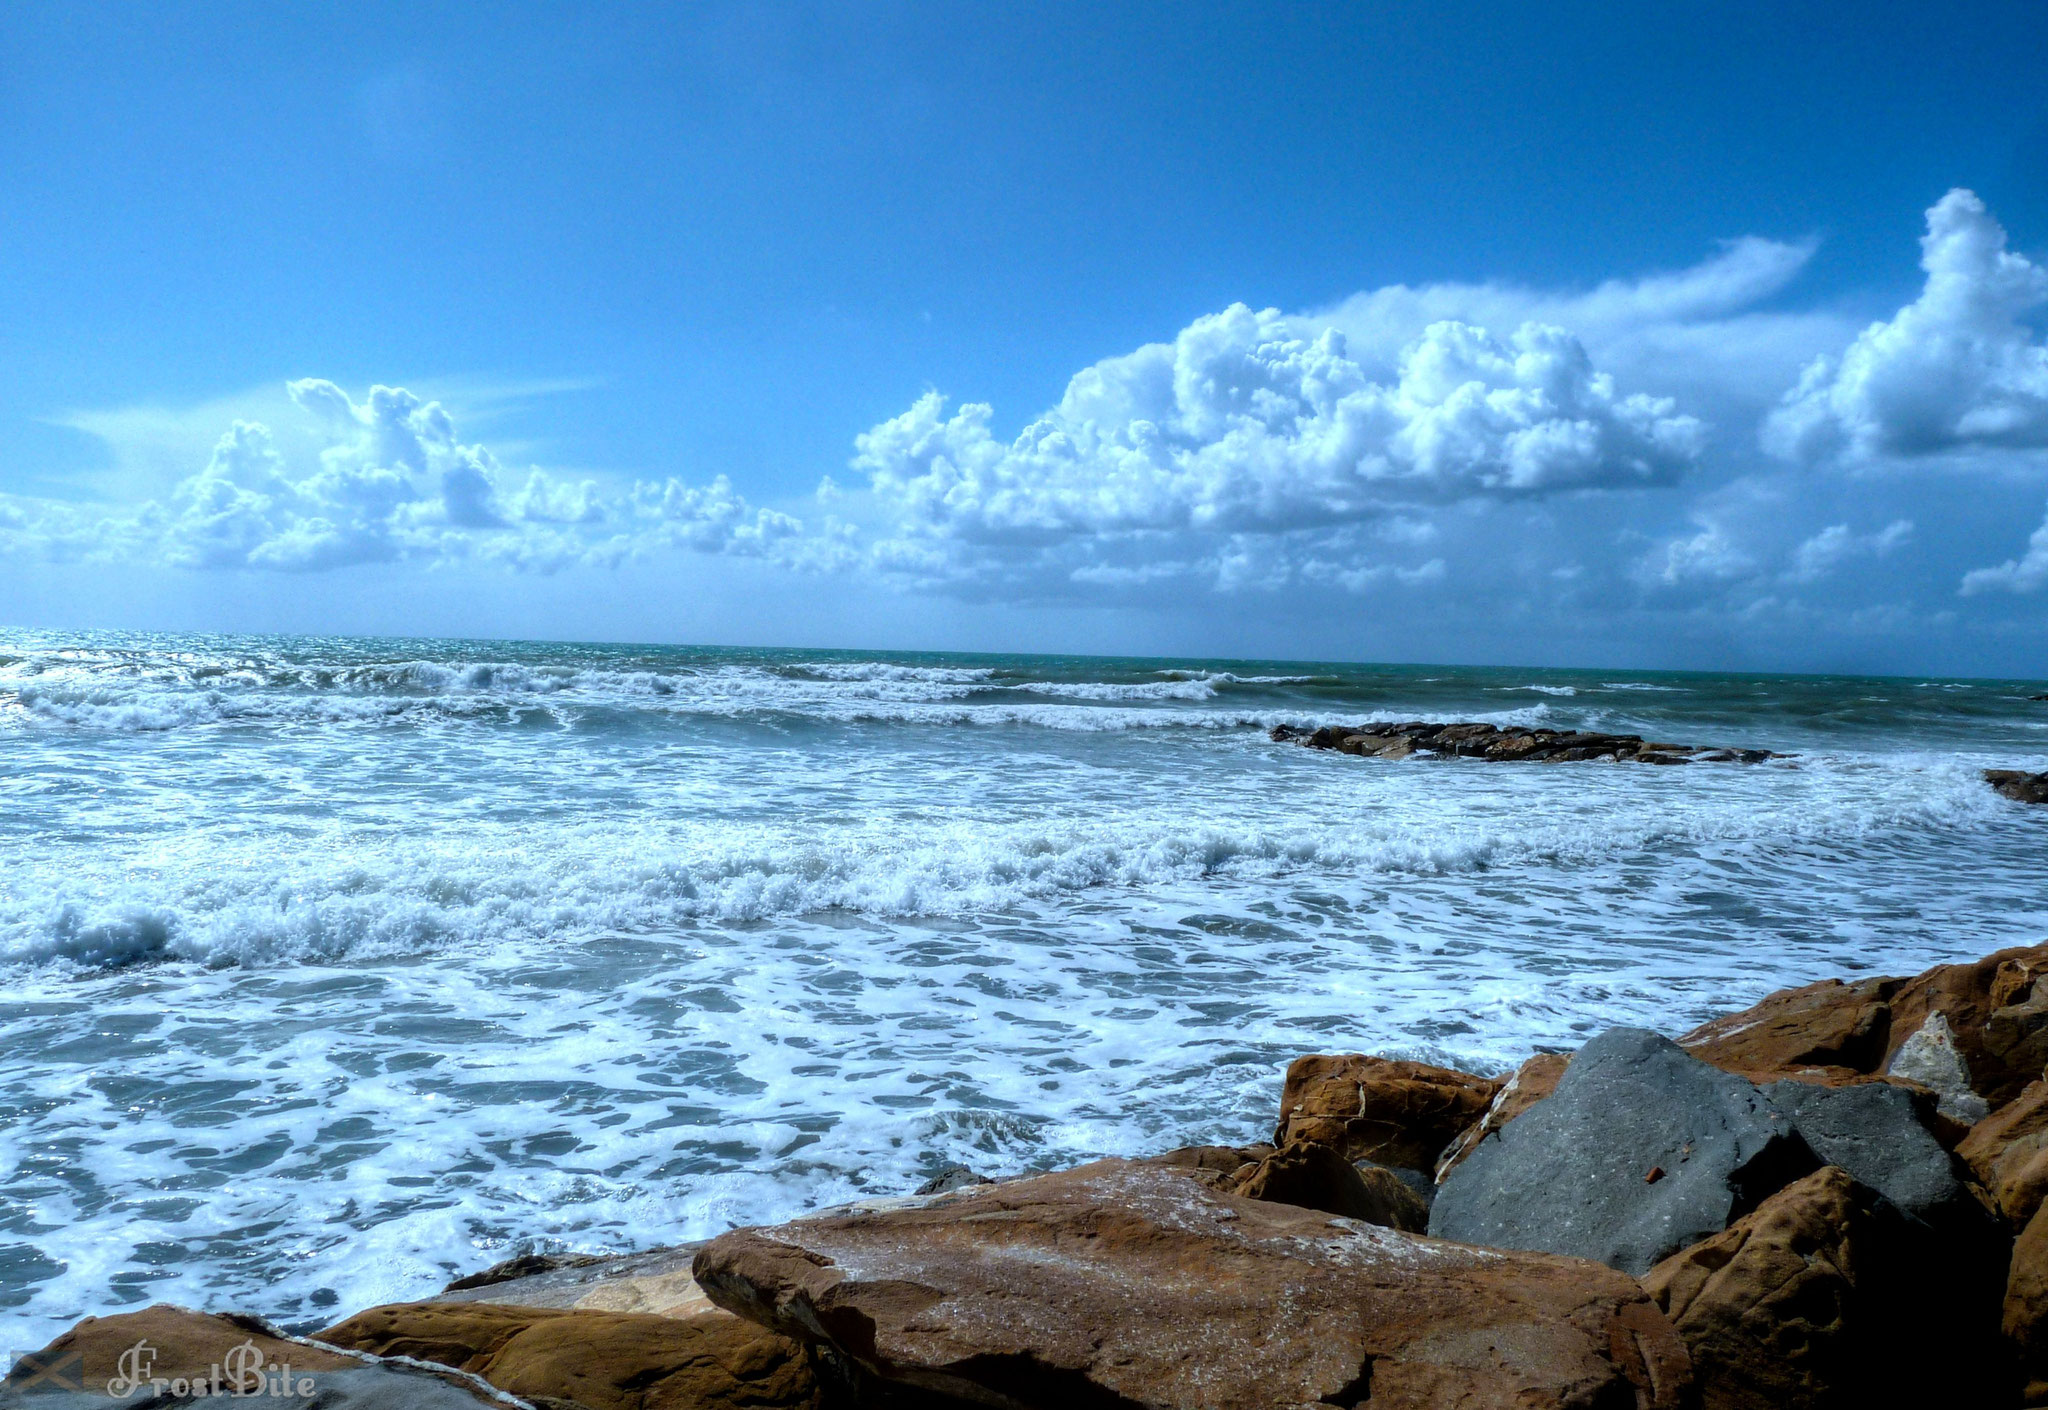 Ocean Ladispoli, Italy